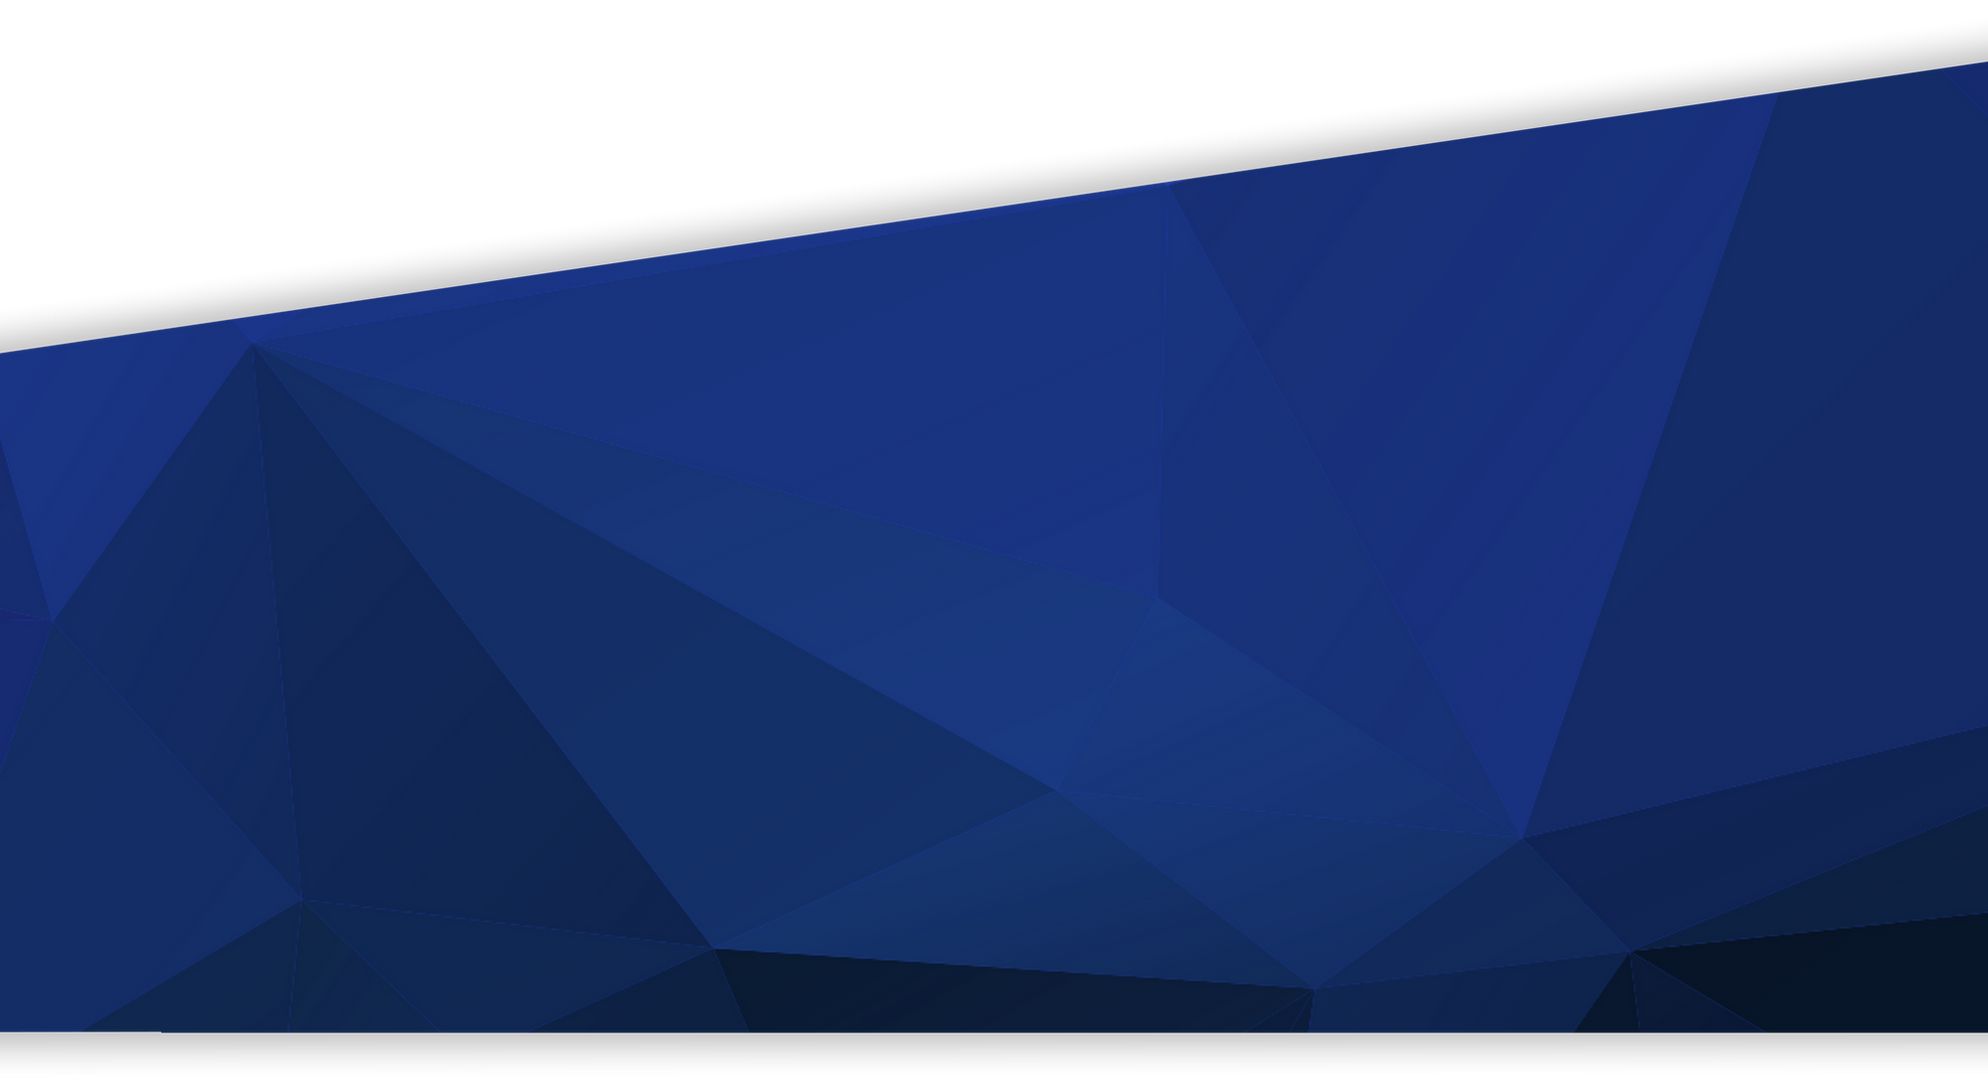 רקע כחול.png